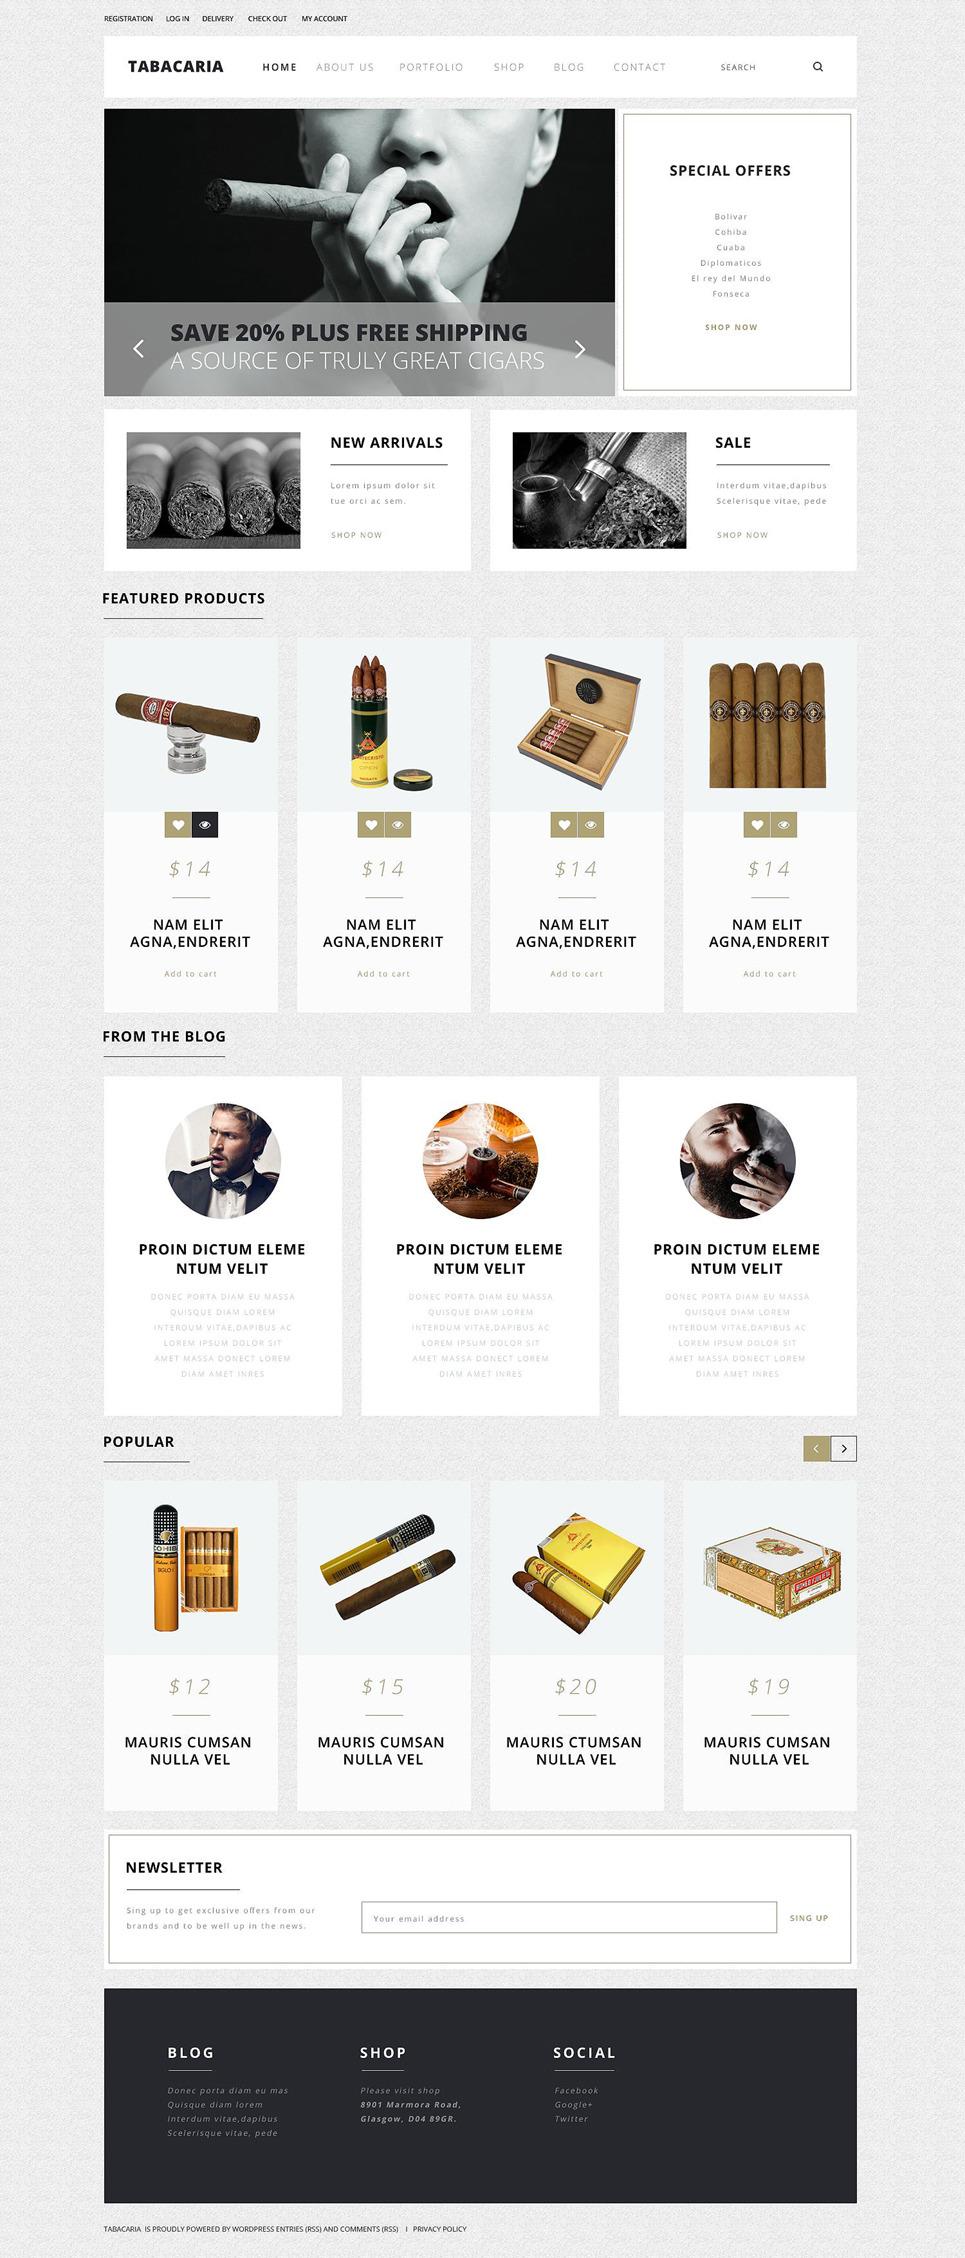 Tobacco Shop WooCommerce Theme New Screenshots BIG